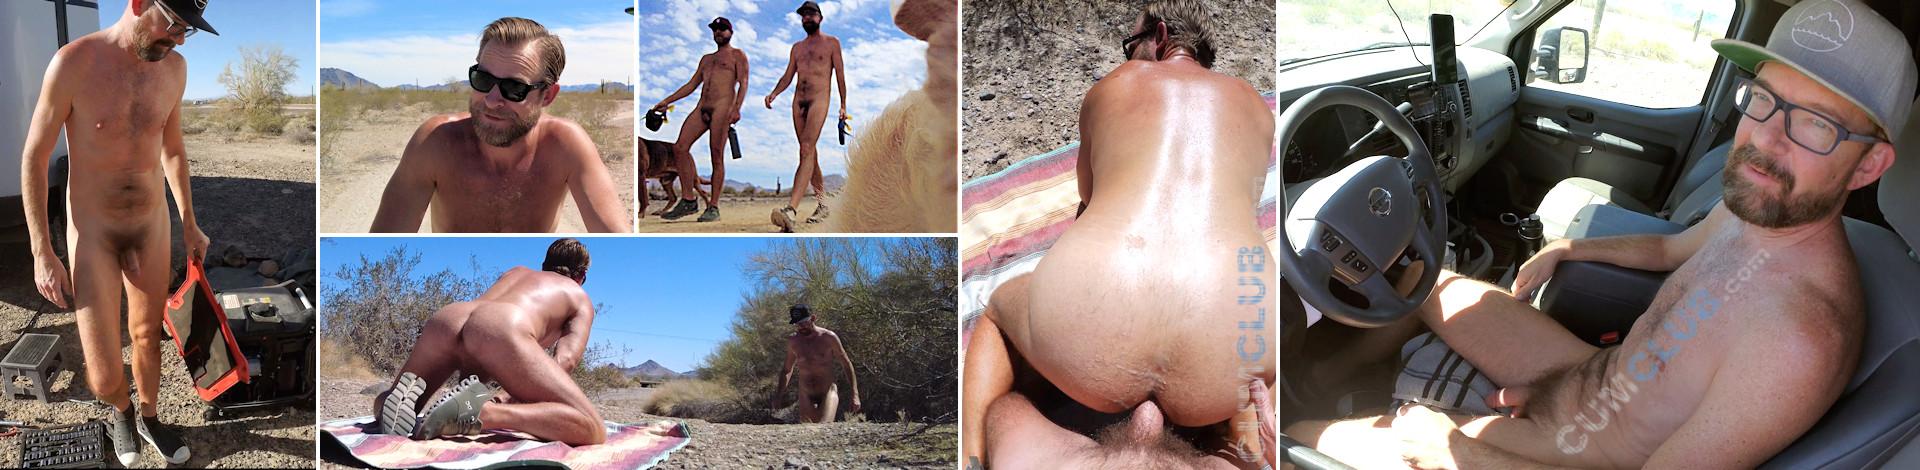 FullFrontal.Life | Naked Challenge | Outdoor Cum Fuck (ep 8)